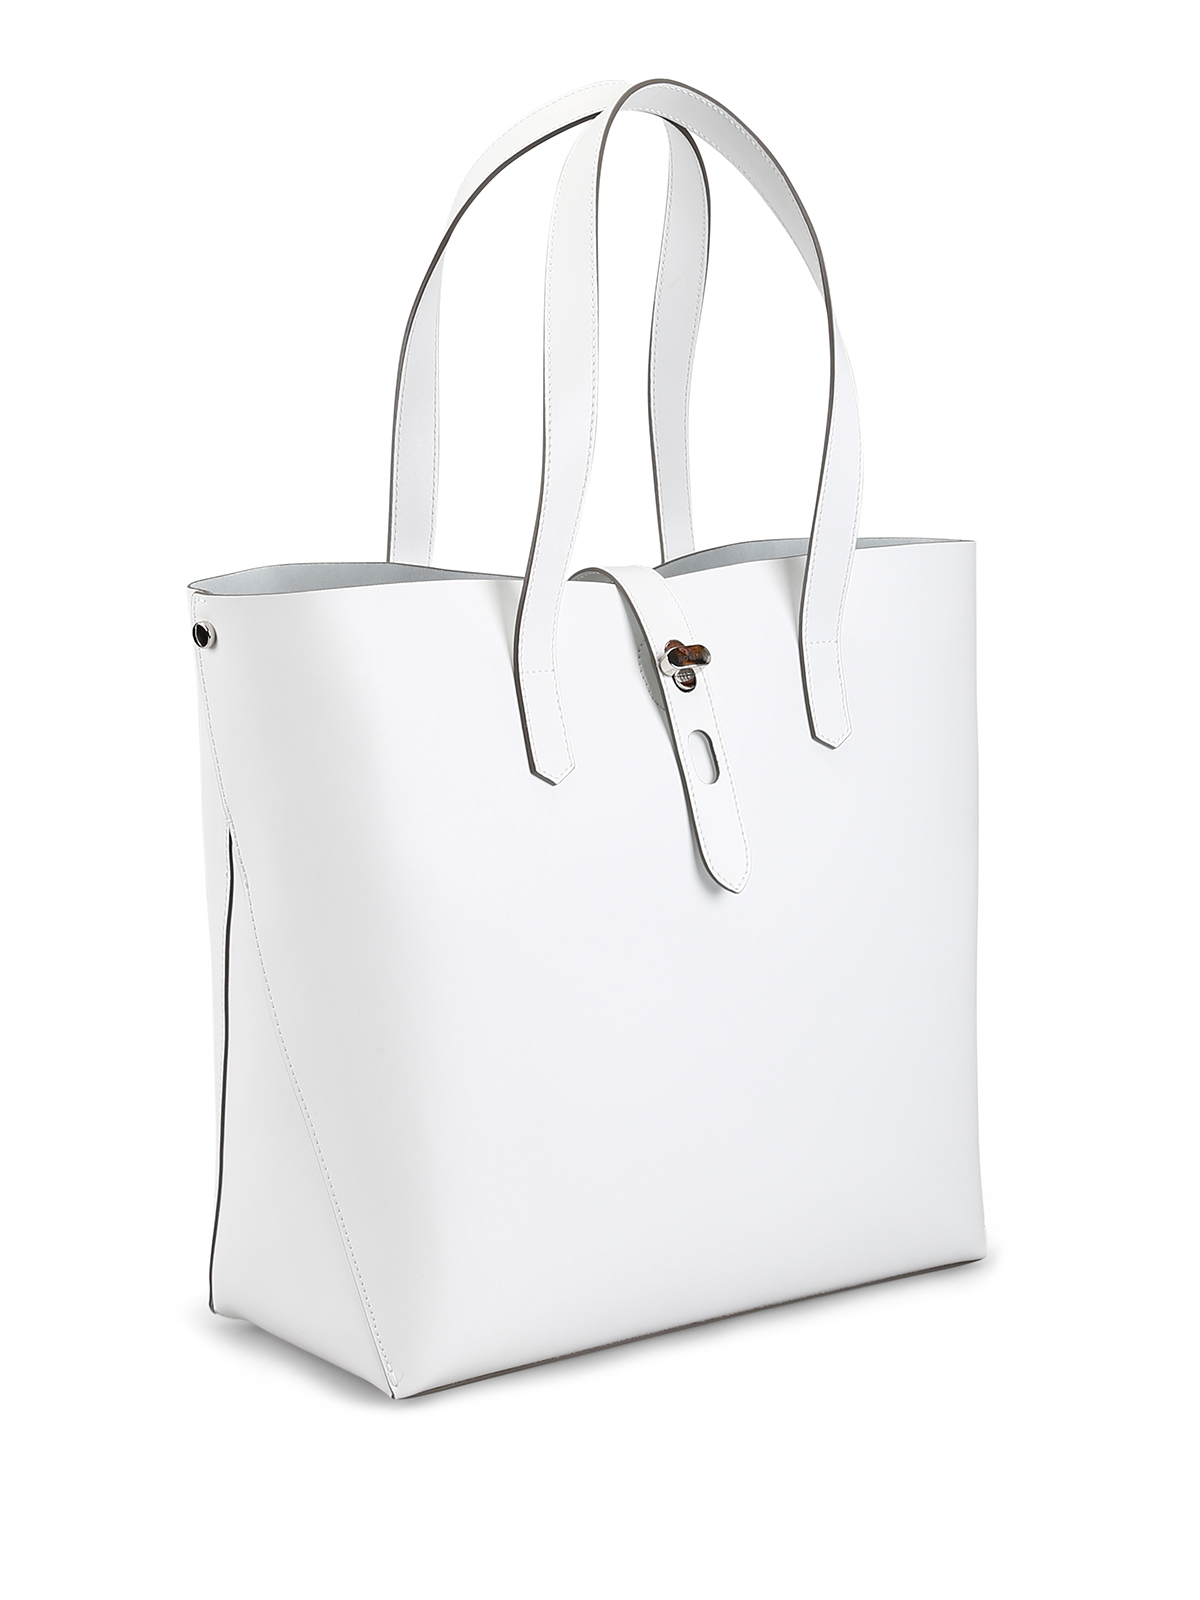 cf33c3b4c4b Hogan - White leather tote - totes bags - KBW010A1400J60B001   iKRIX.com